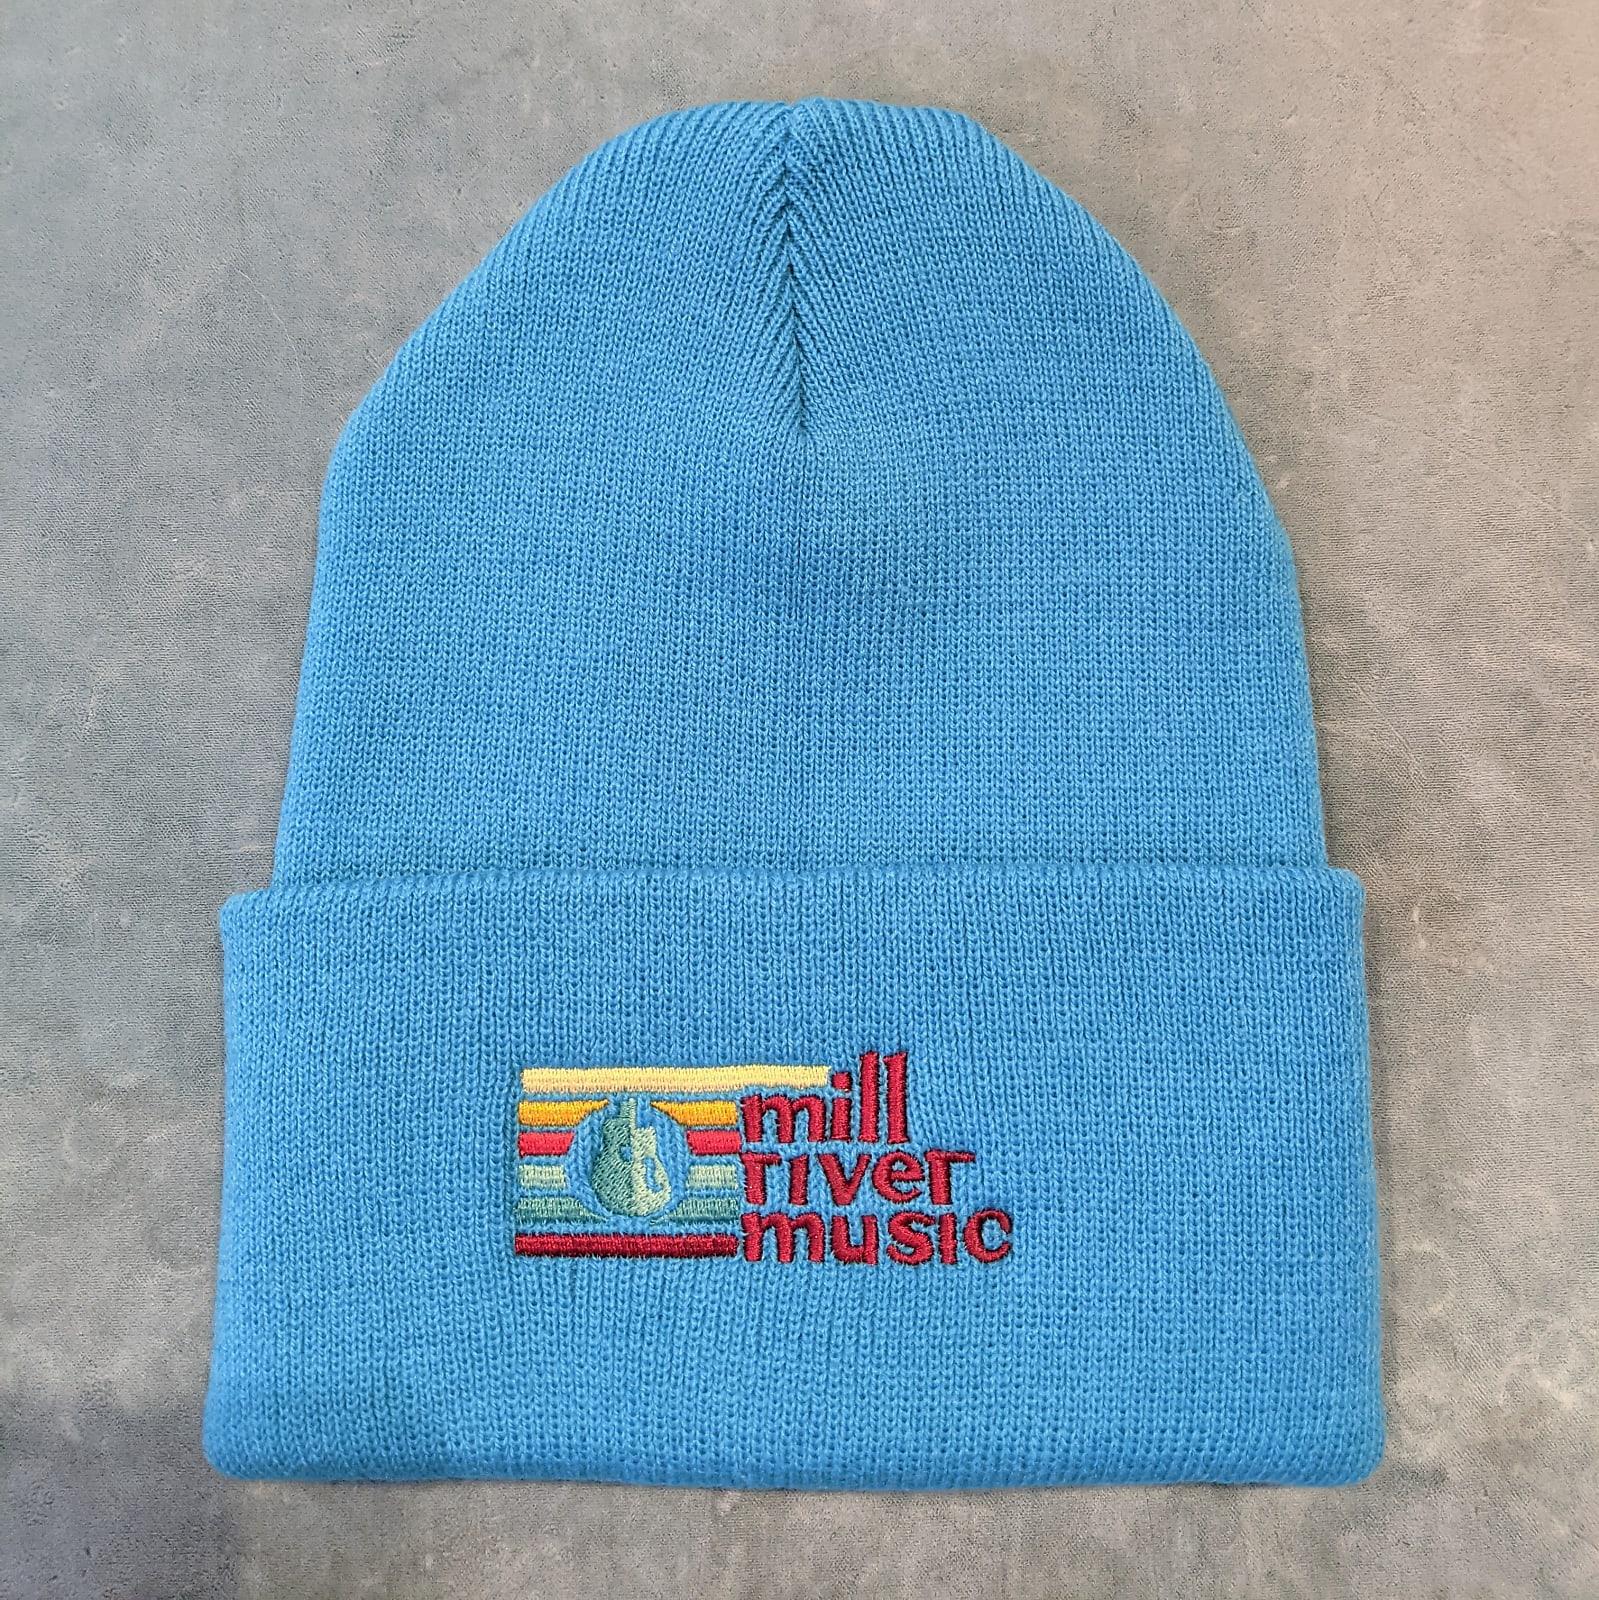 Mill River Music Embroidered Cuff Beanie 1st Ed Main Logo Neon Blue